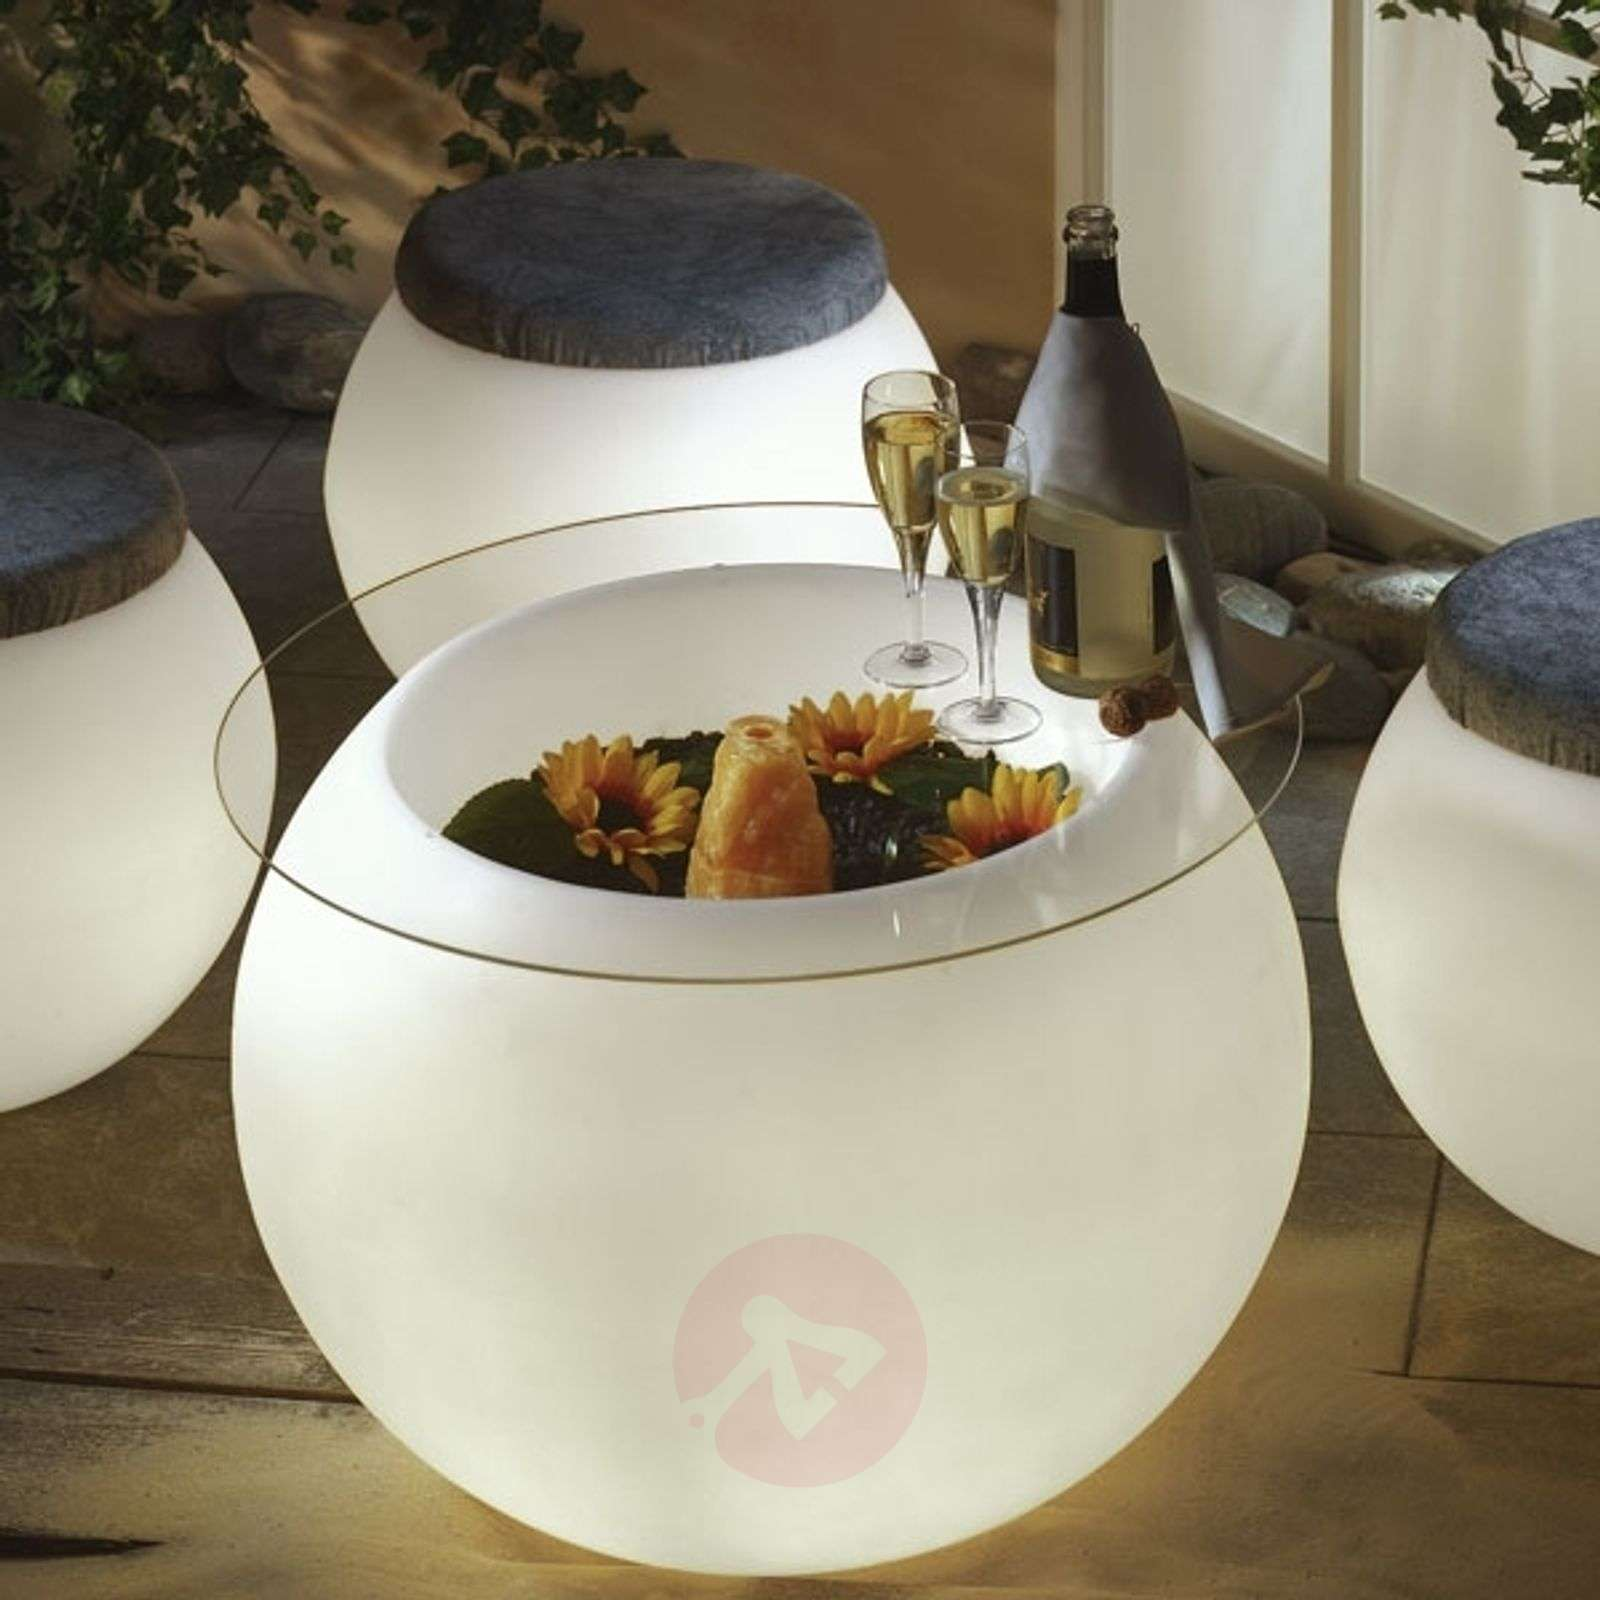 Plexiglas® XT Table Top-3050010X-01